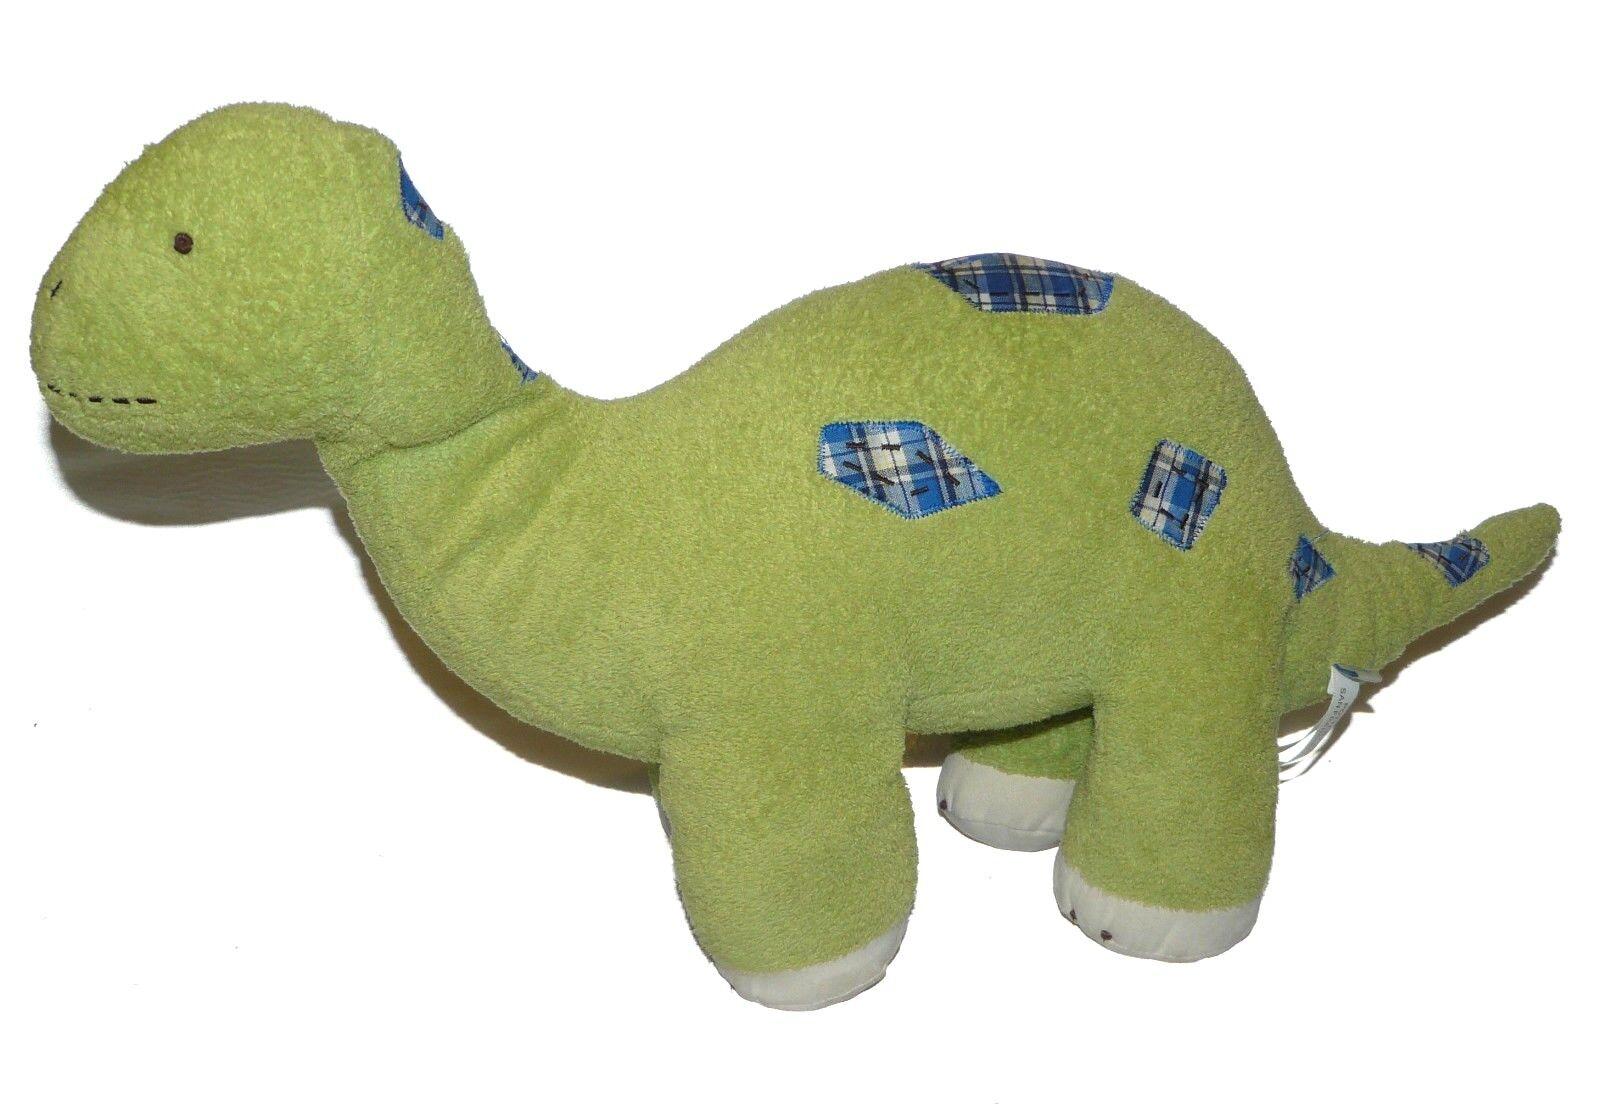 Pottery Barn Kids verde Dinosaur blu Plaid Patches Plush Stuffed Animal 22